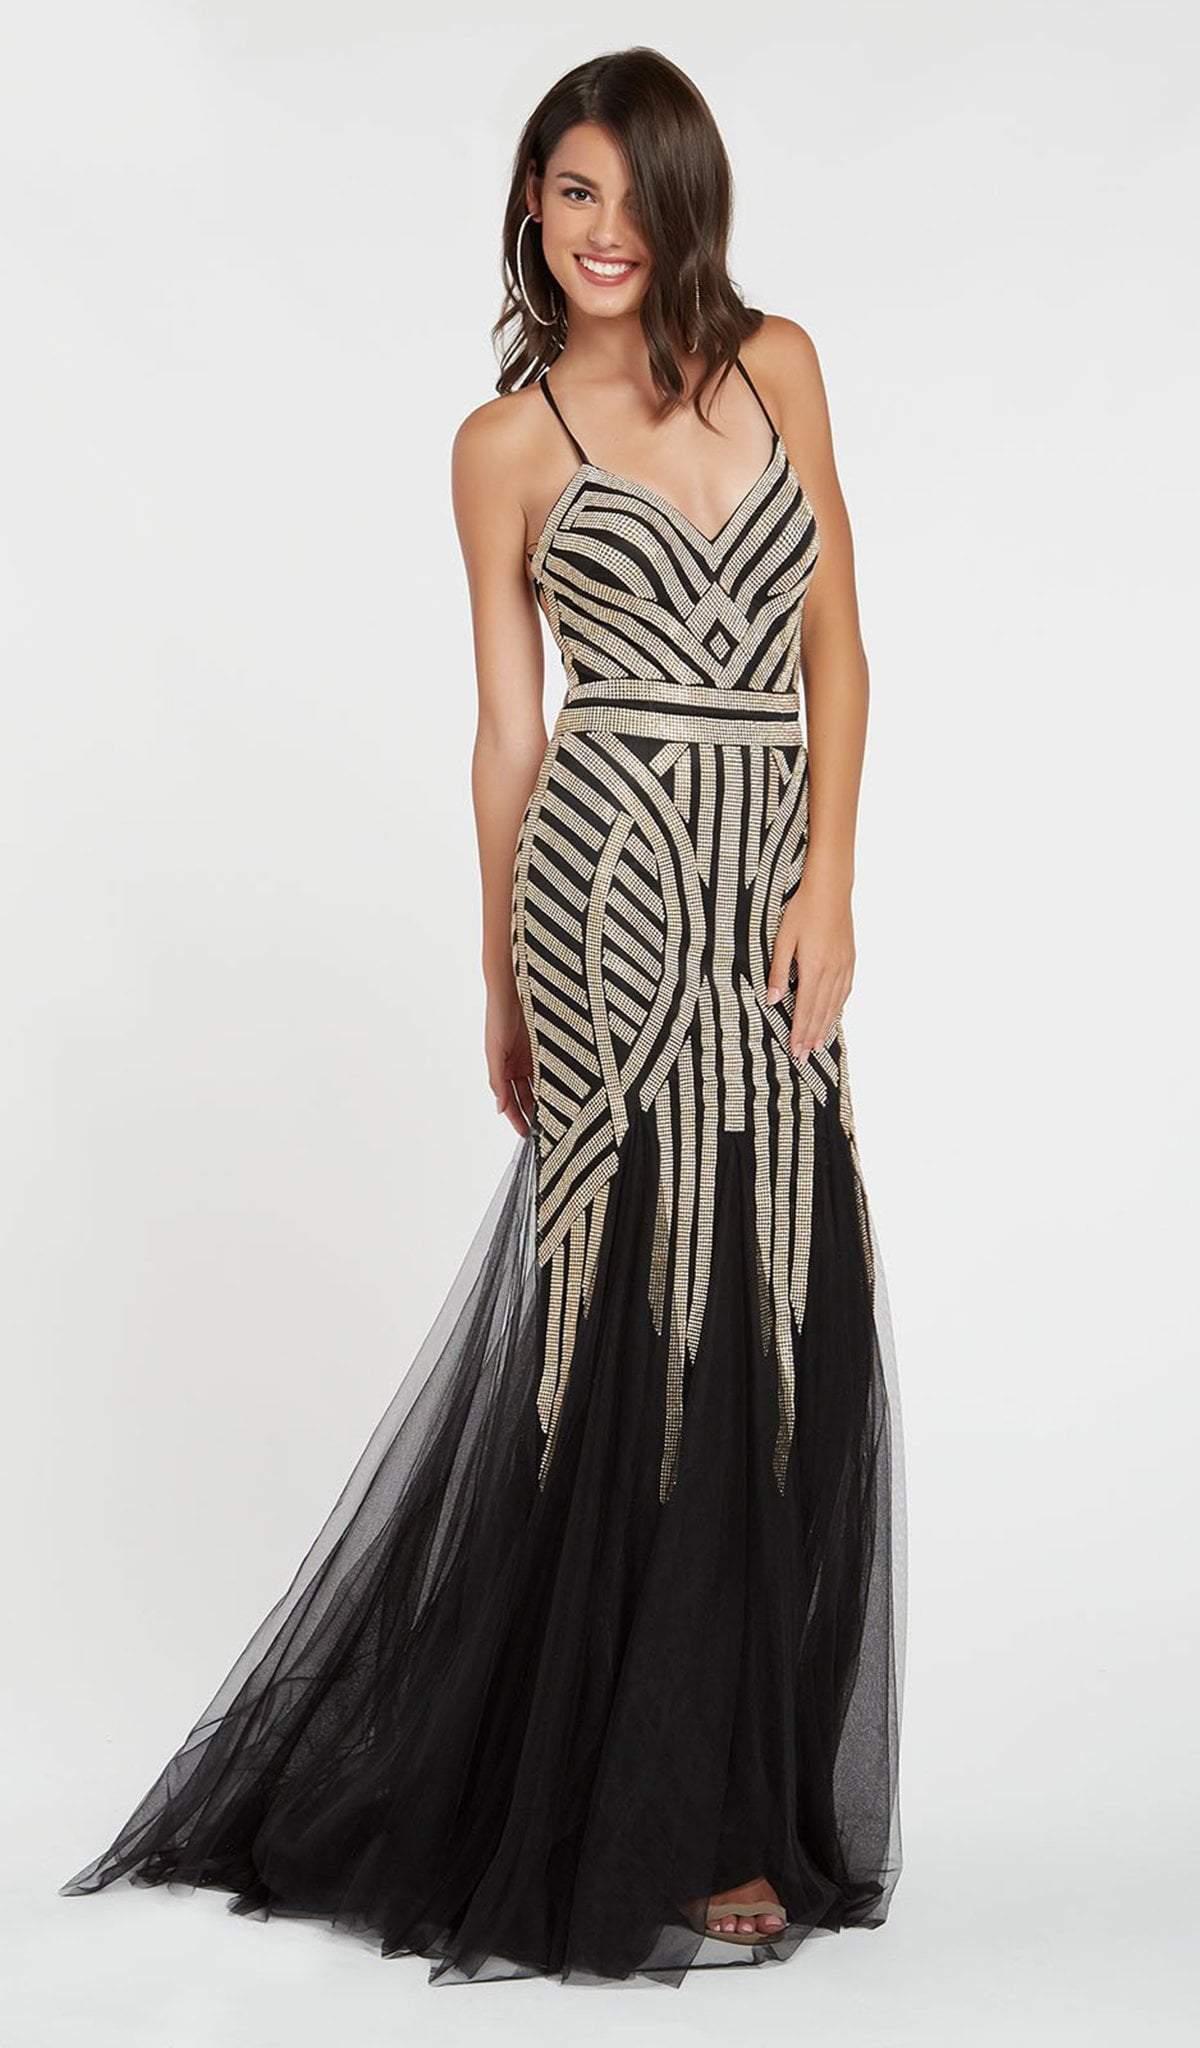 Alyce Paris - 60520 Geometric Beaded Trumpet Godet Gown